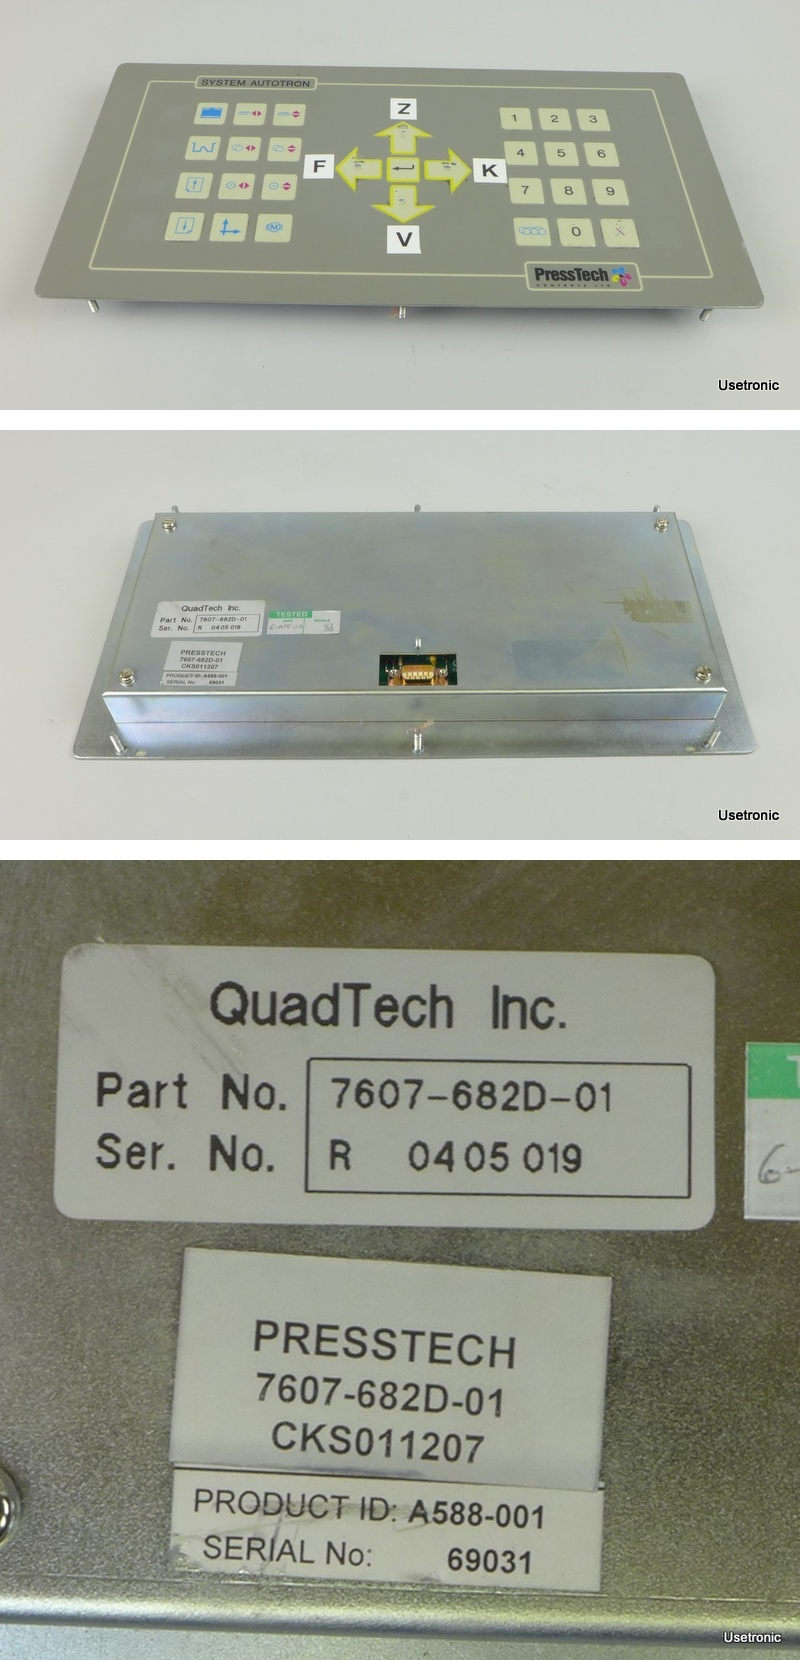 PressTech 7607-682D-01 A588-001